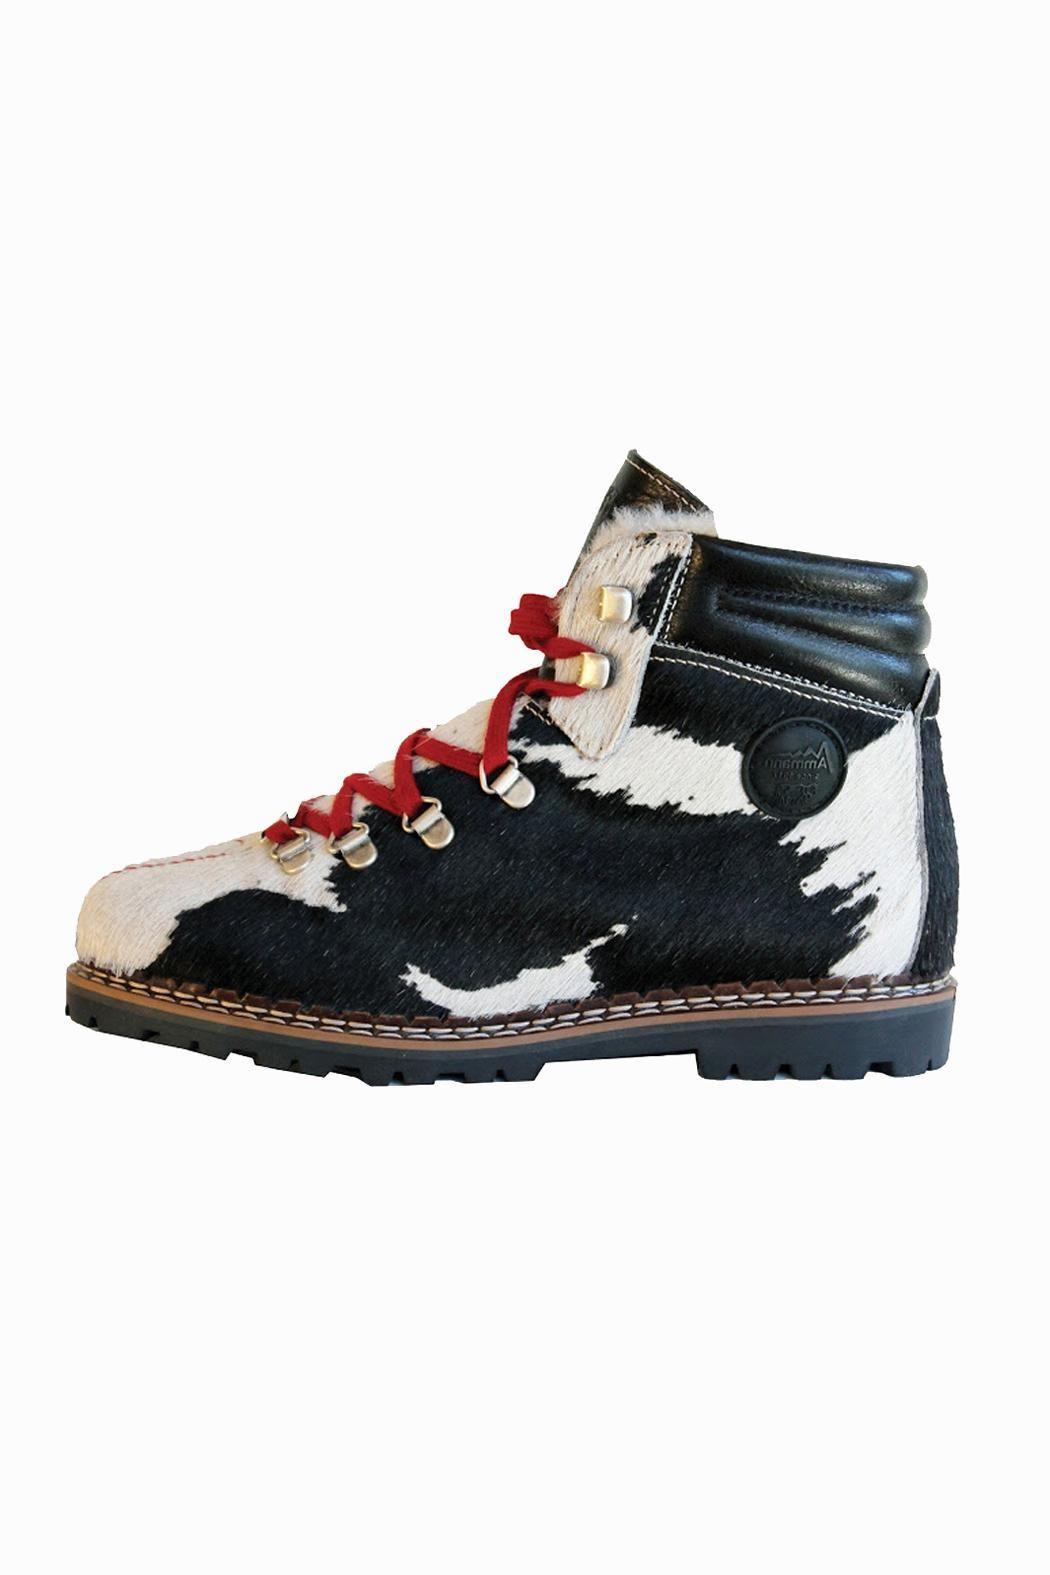 Ammann Town Hiker   High ankle boots, Shoe boots, Ski fashion